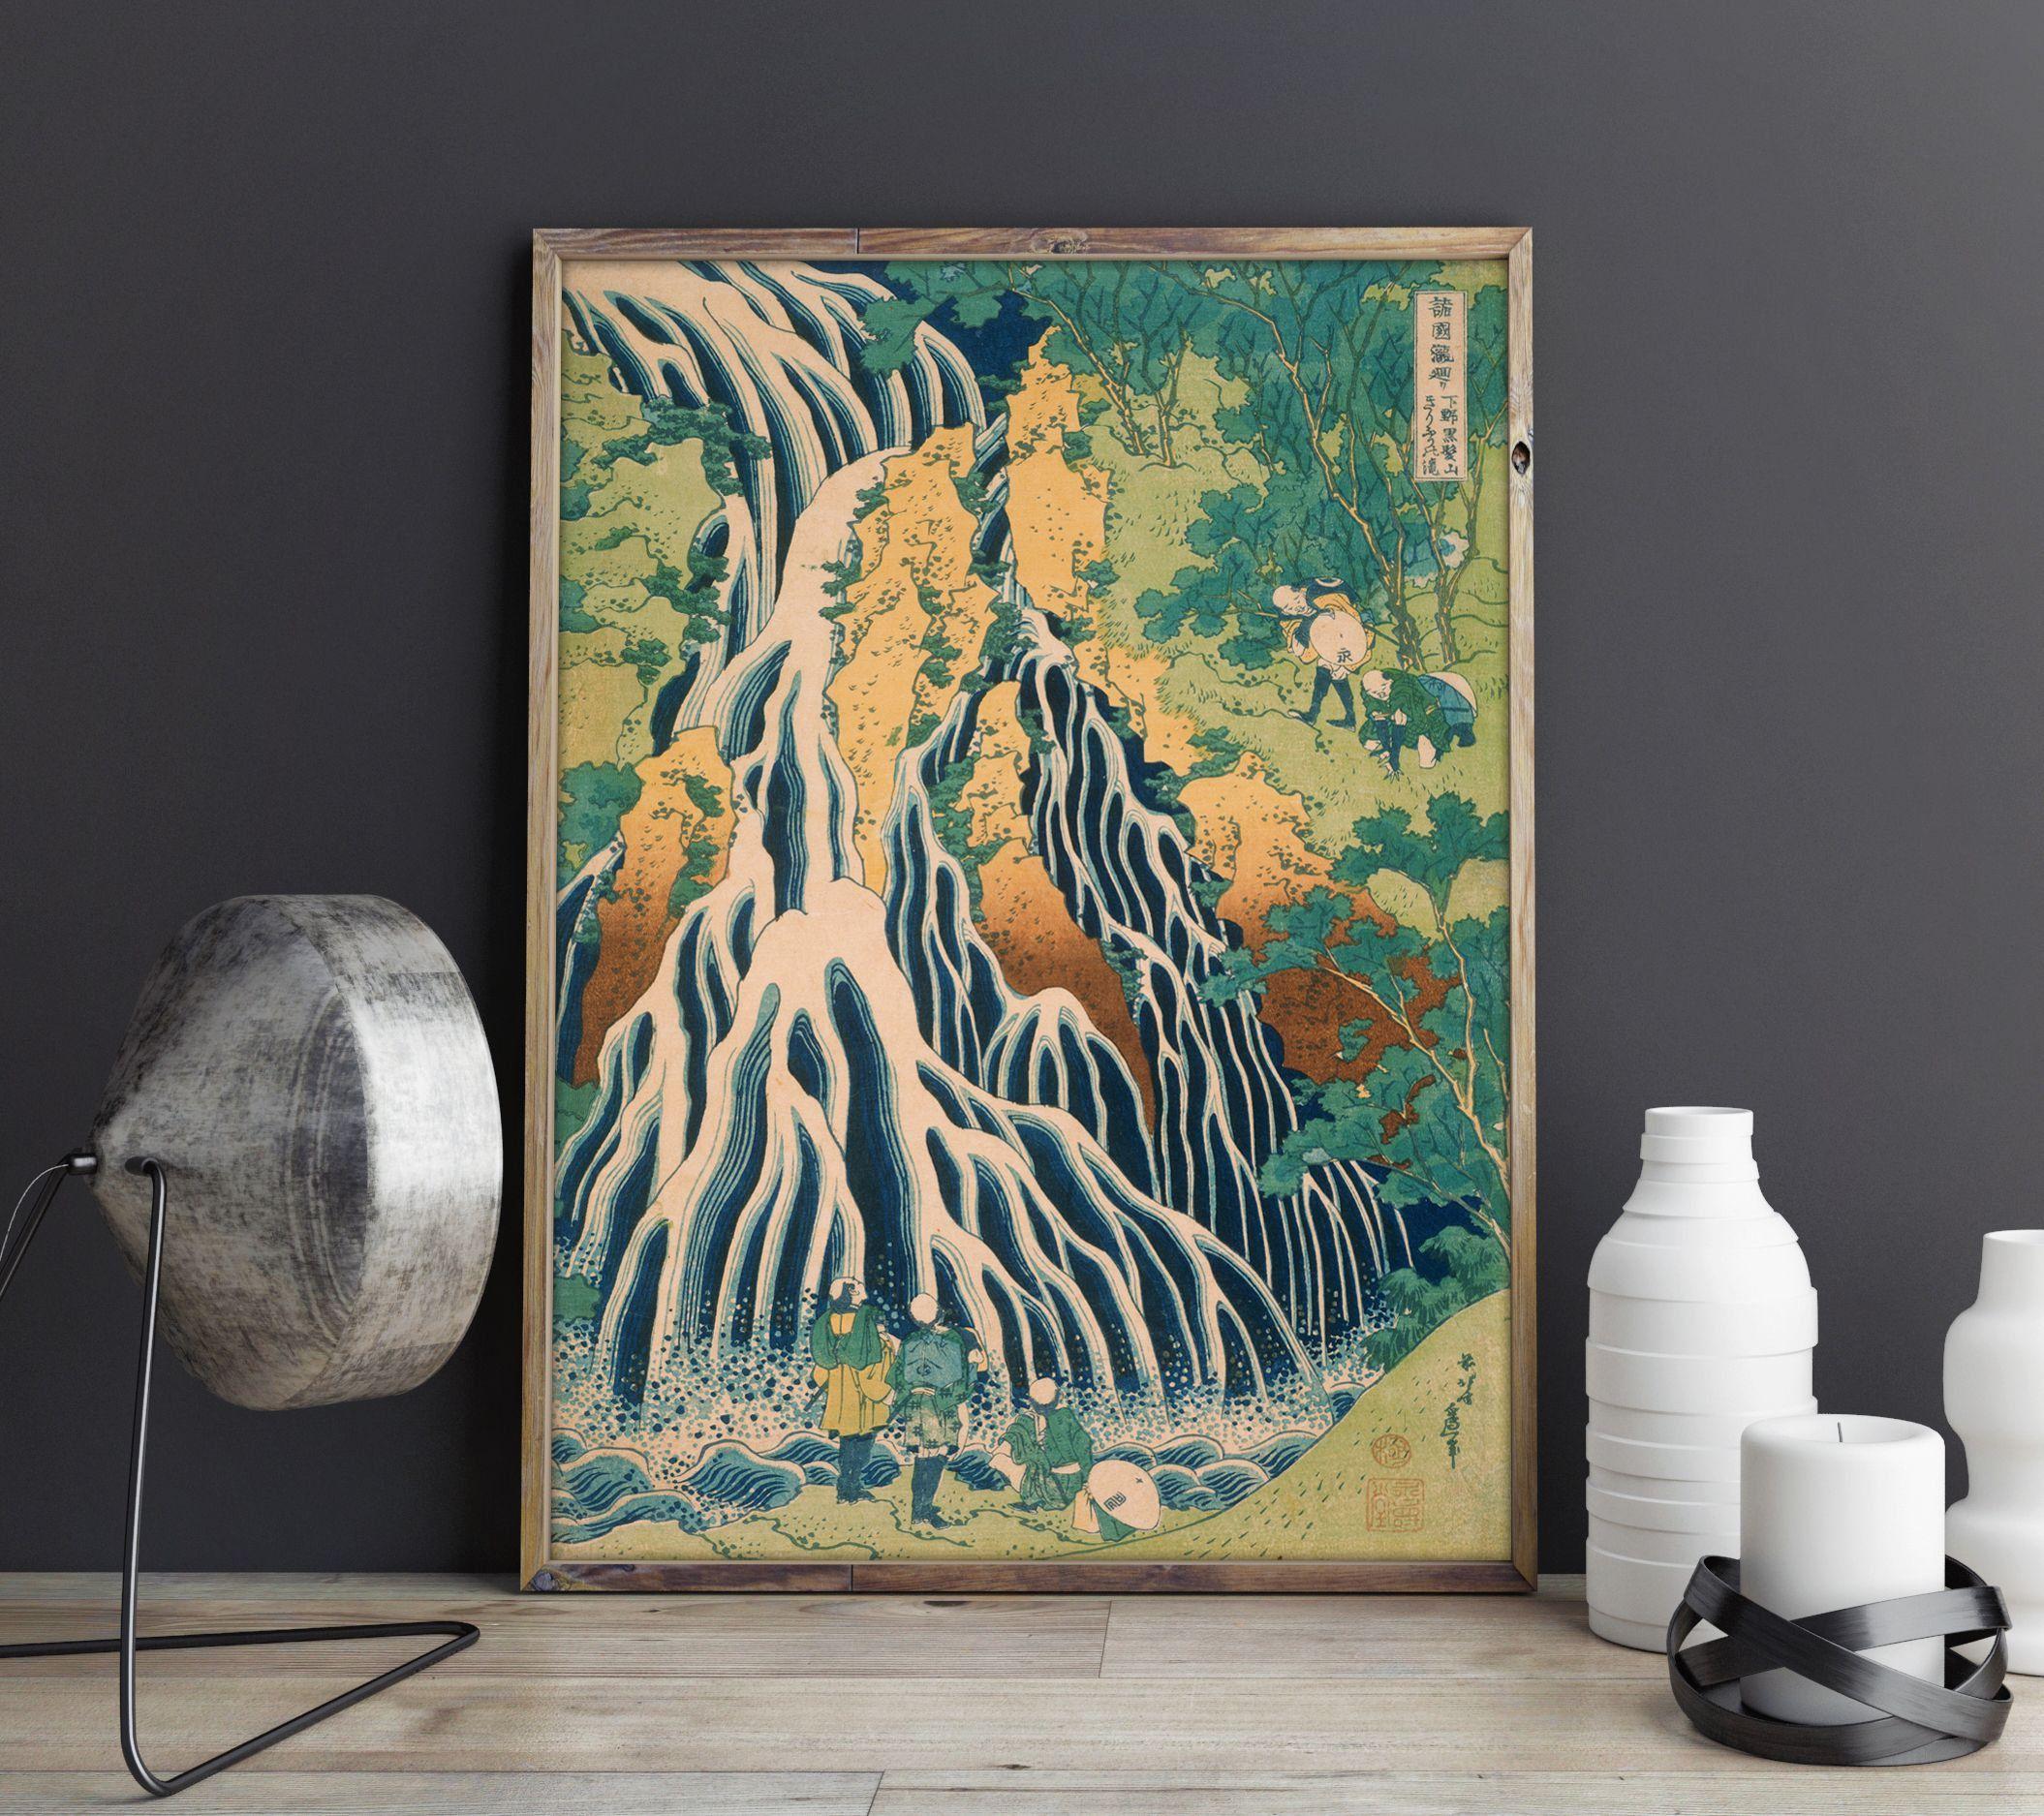 Hiroshige Waterfall Japanese Woodblock Poster Print Vintage Etsy Japanese Wall Art Japanese Wall Decor Japan Wall Art